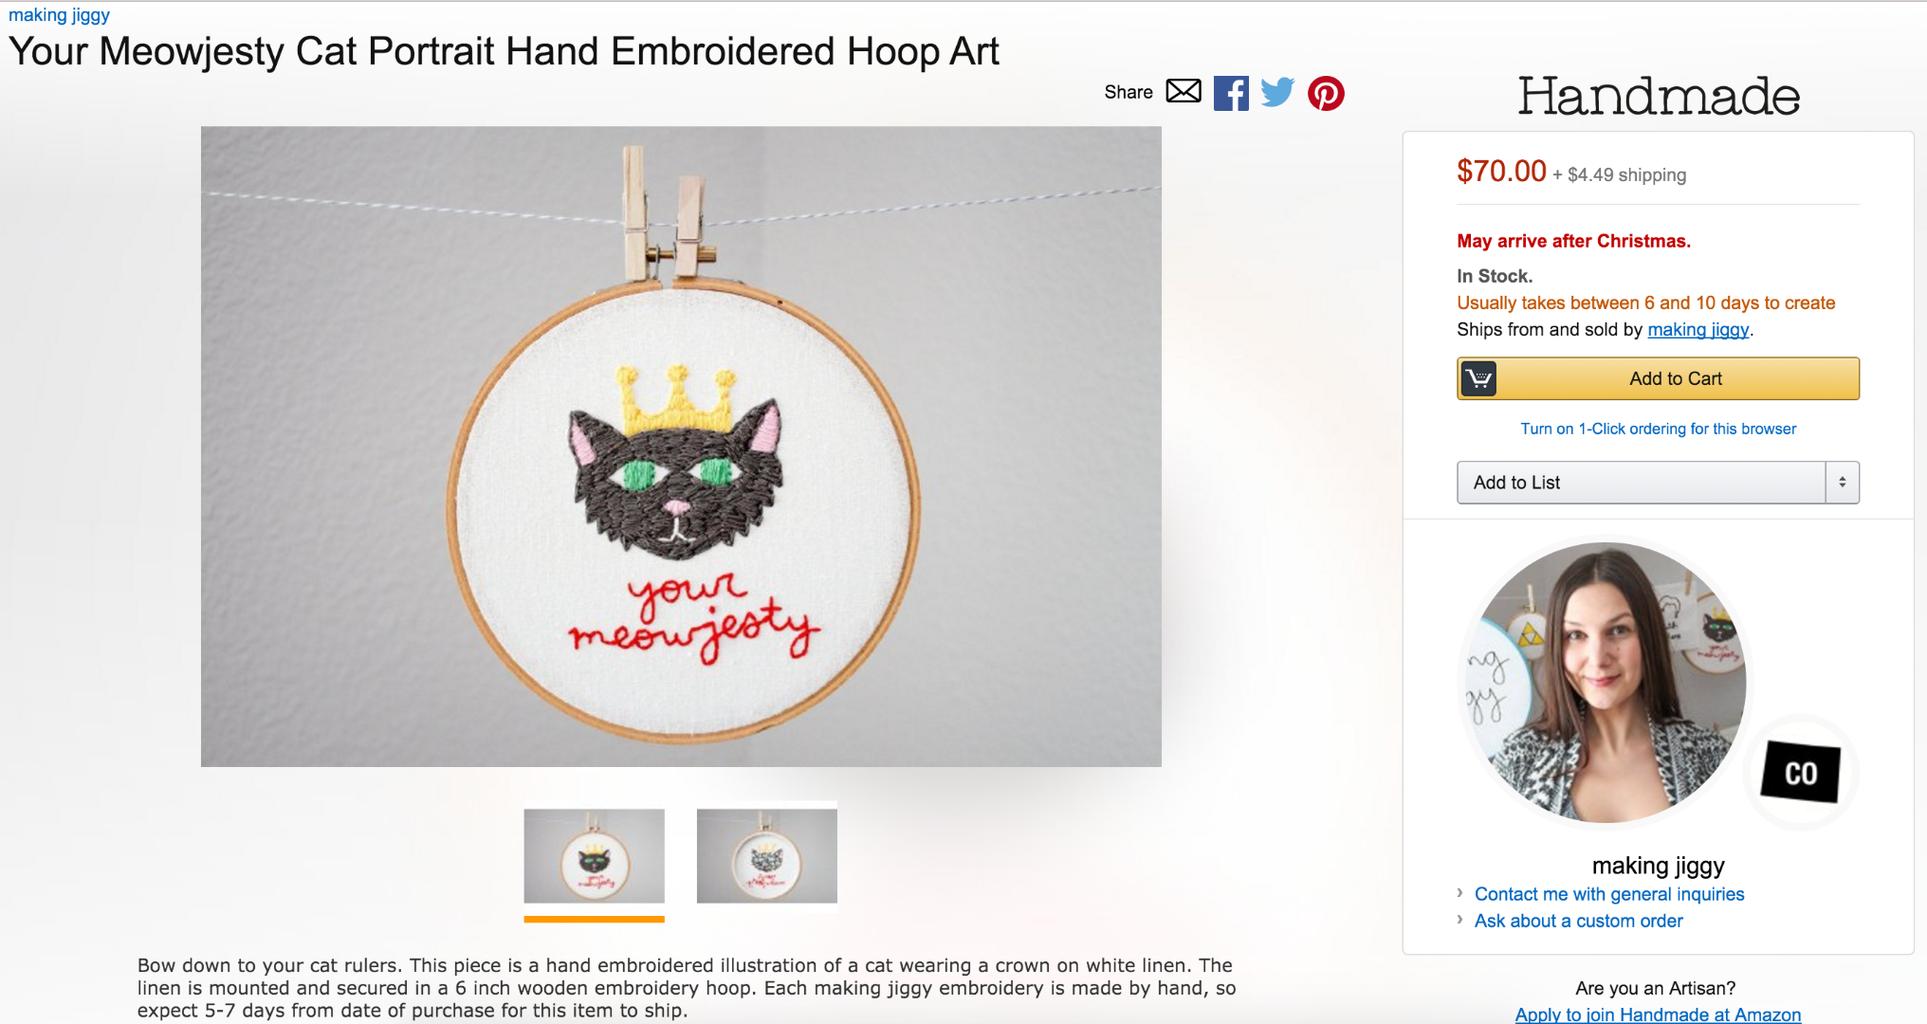 Creating a Handmade at Amazon Listing